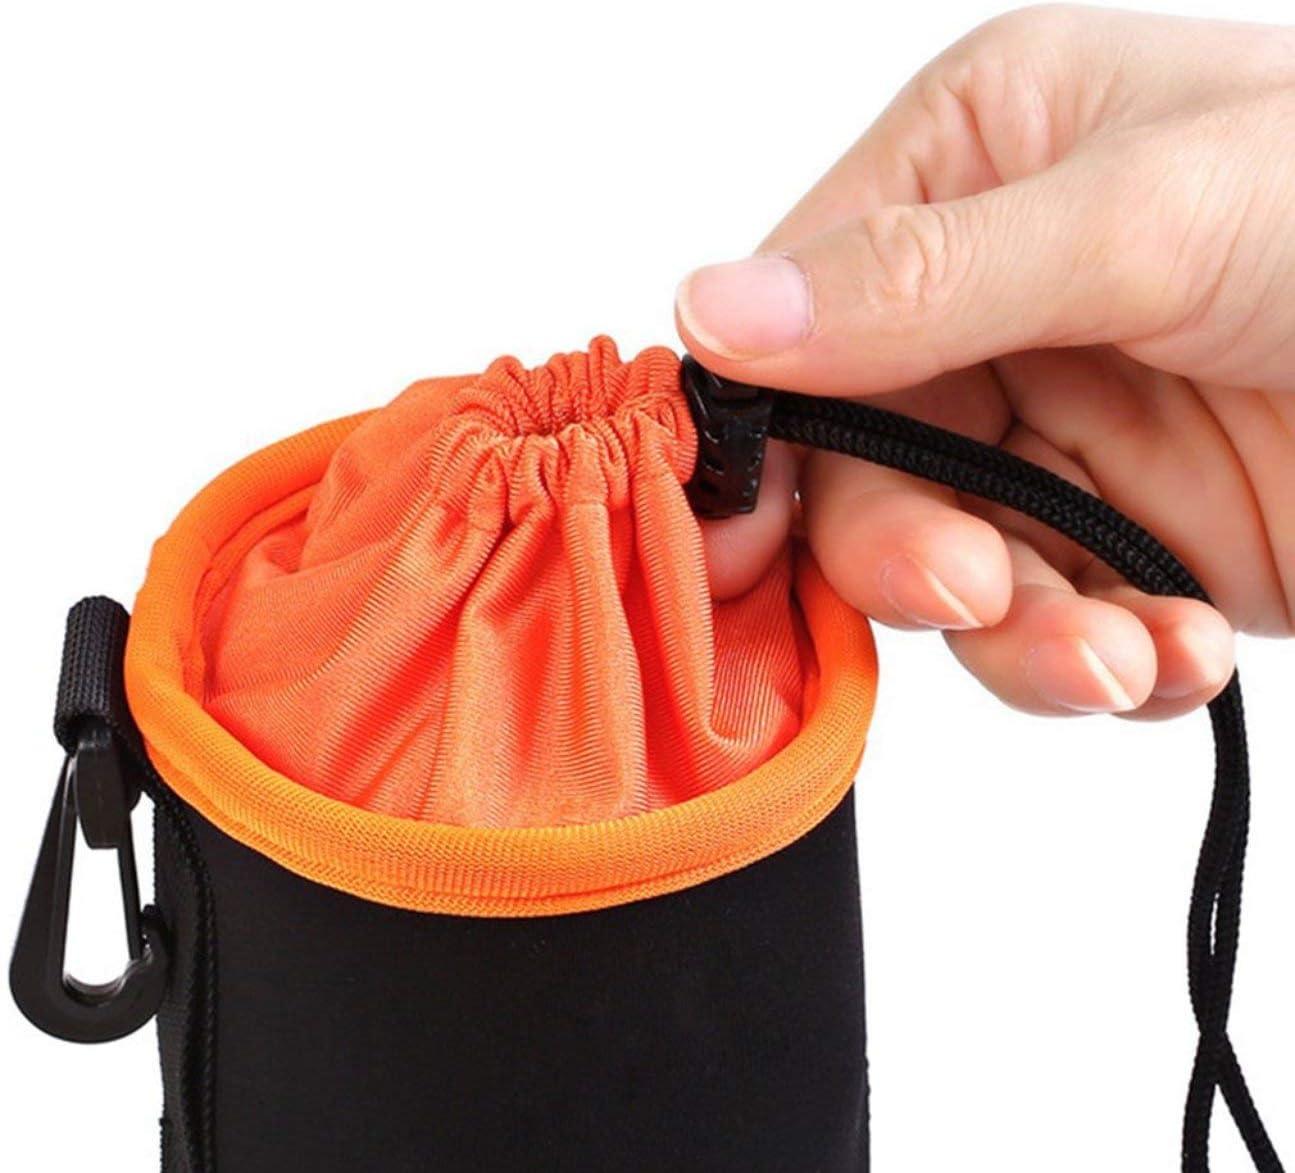 HIPENGYANBAIHU Neoprene Pouch DSLR Camera Lens Protective Bag Thicken Waterproof Soft Case Bag Drawstring Locking Camera Lens Bag Case